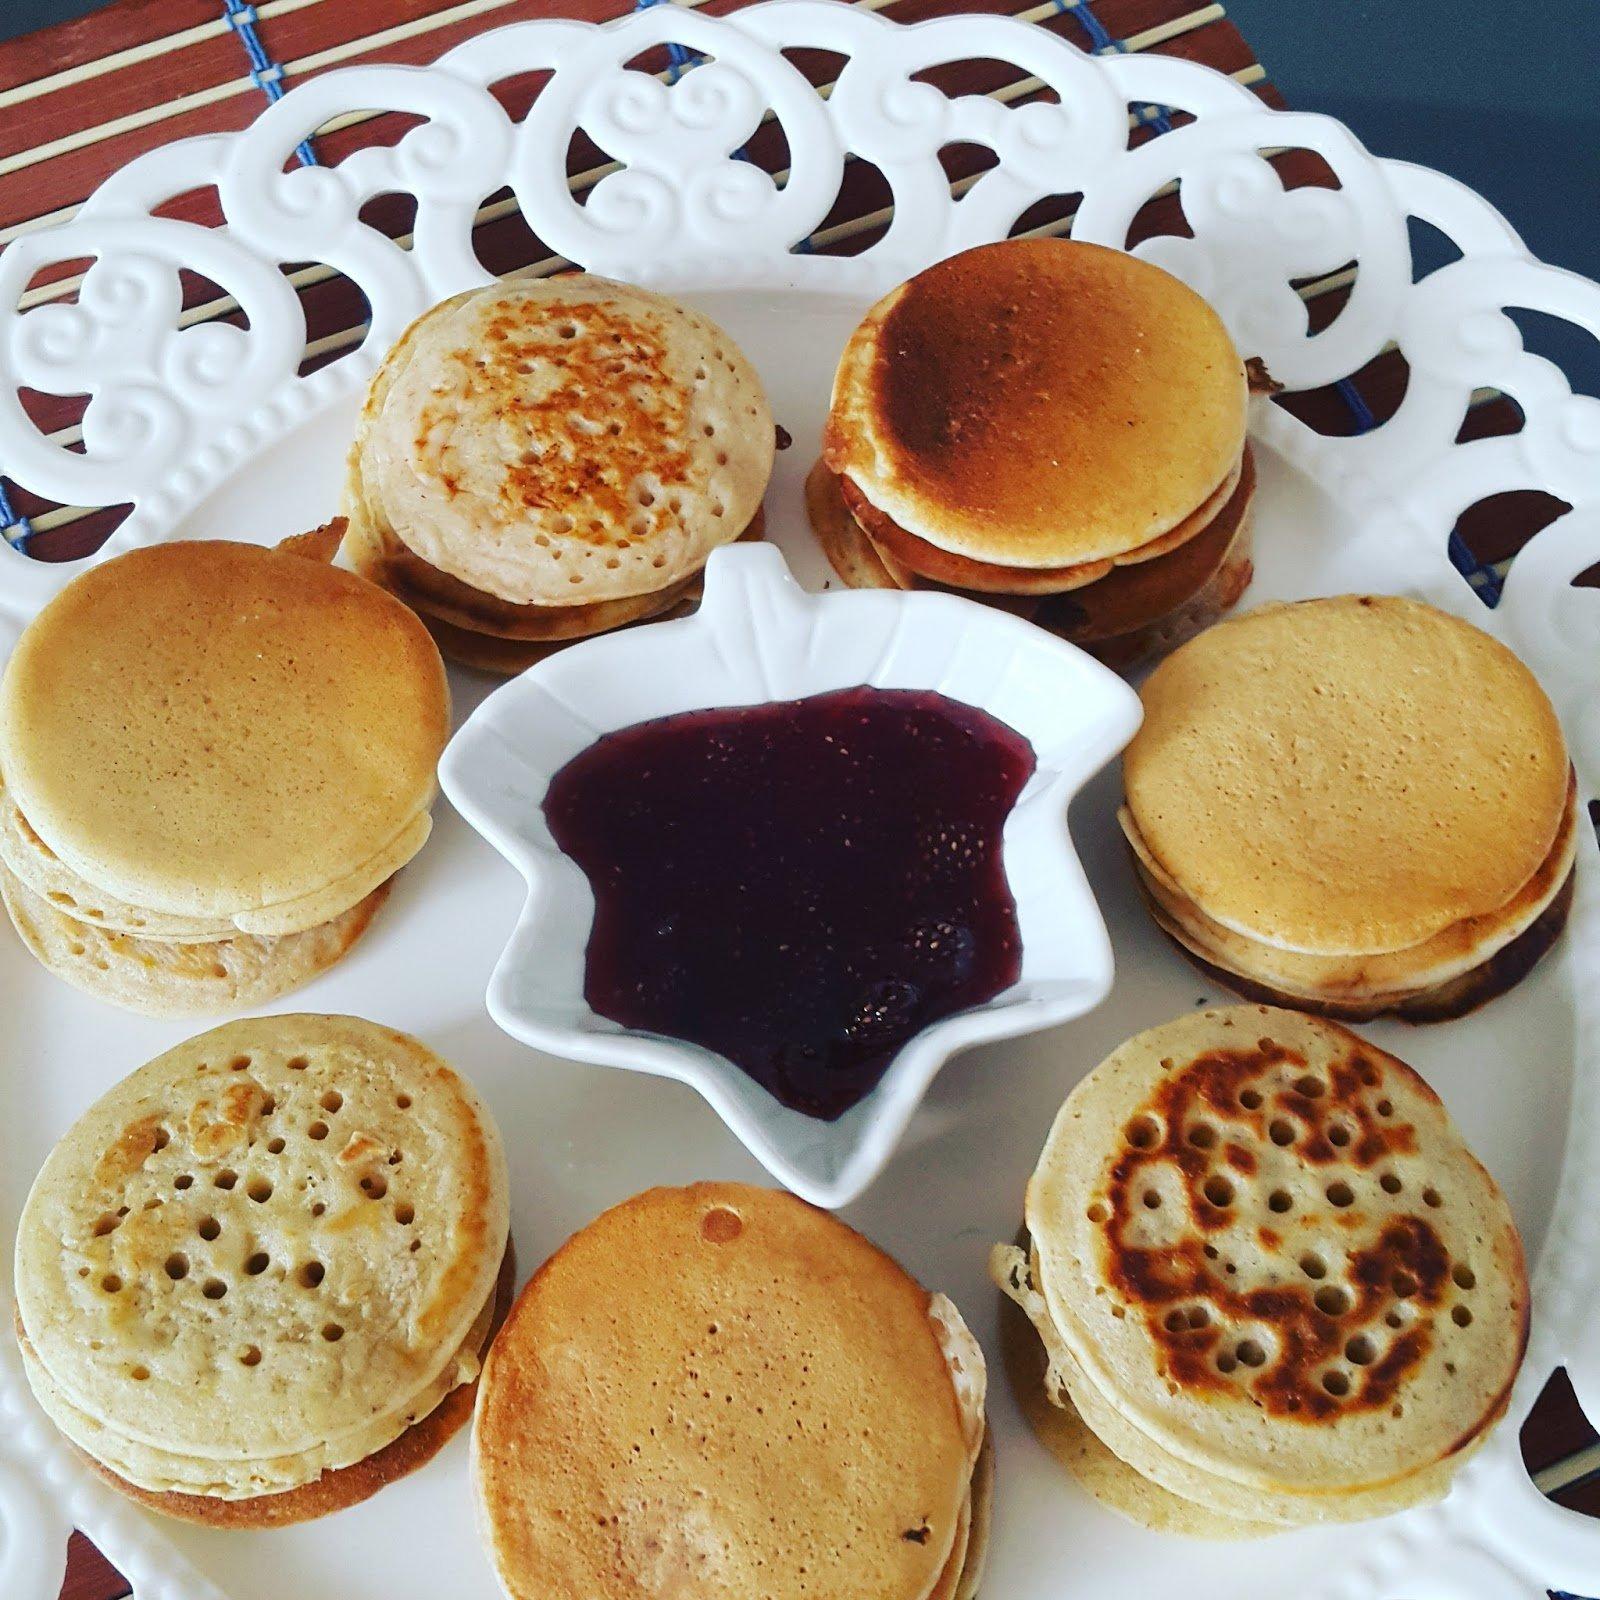 gesunde pancakes einige leckere kalorienarme rezepte gesunde ern hrung rezepte zenideen. Black Bedroom Furniture Sets. Home Design Ideas